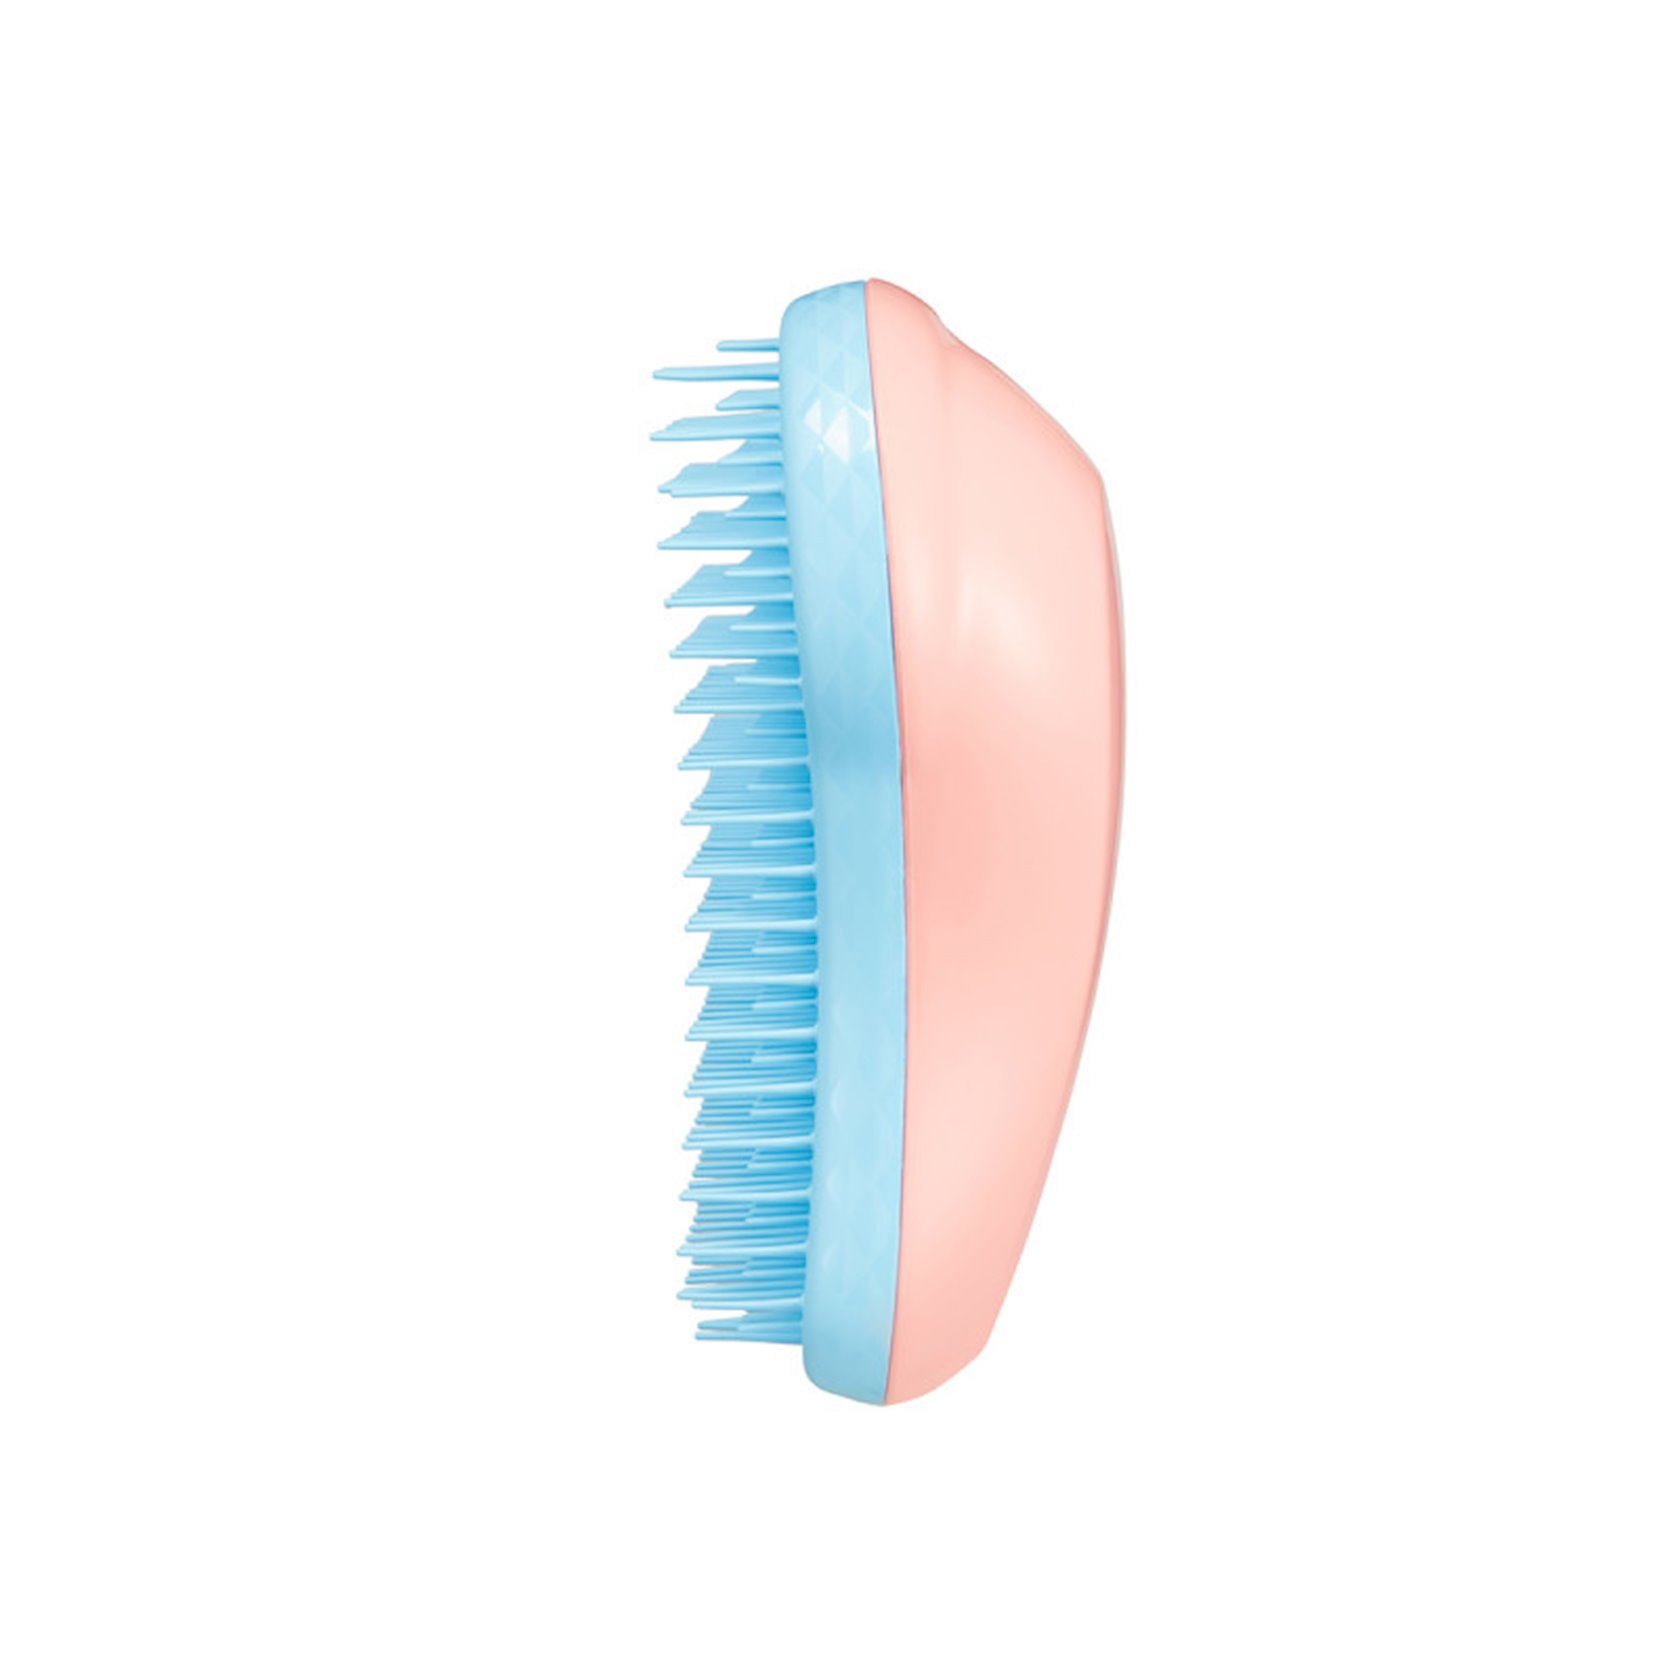 Saç fırçası Tangle Teezer Fine & Fraglie Peach Sky Yığcam